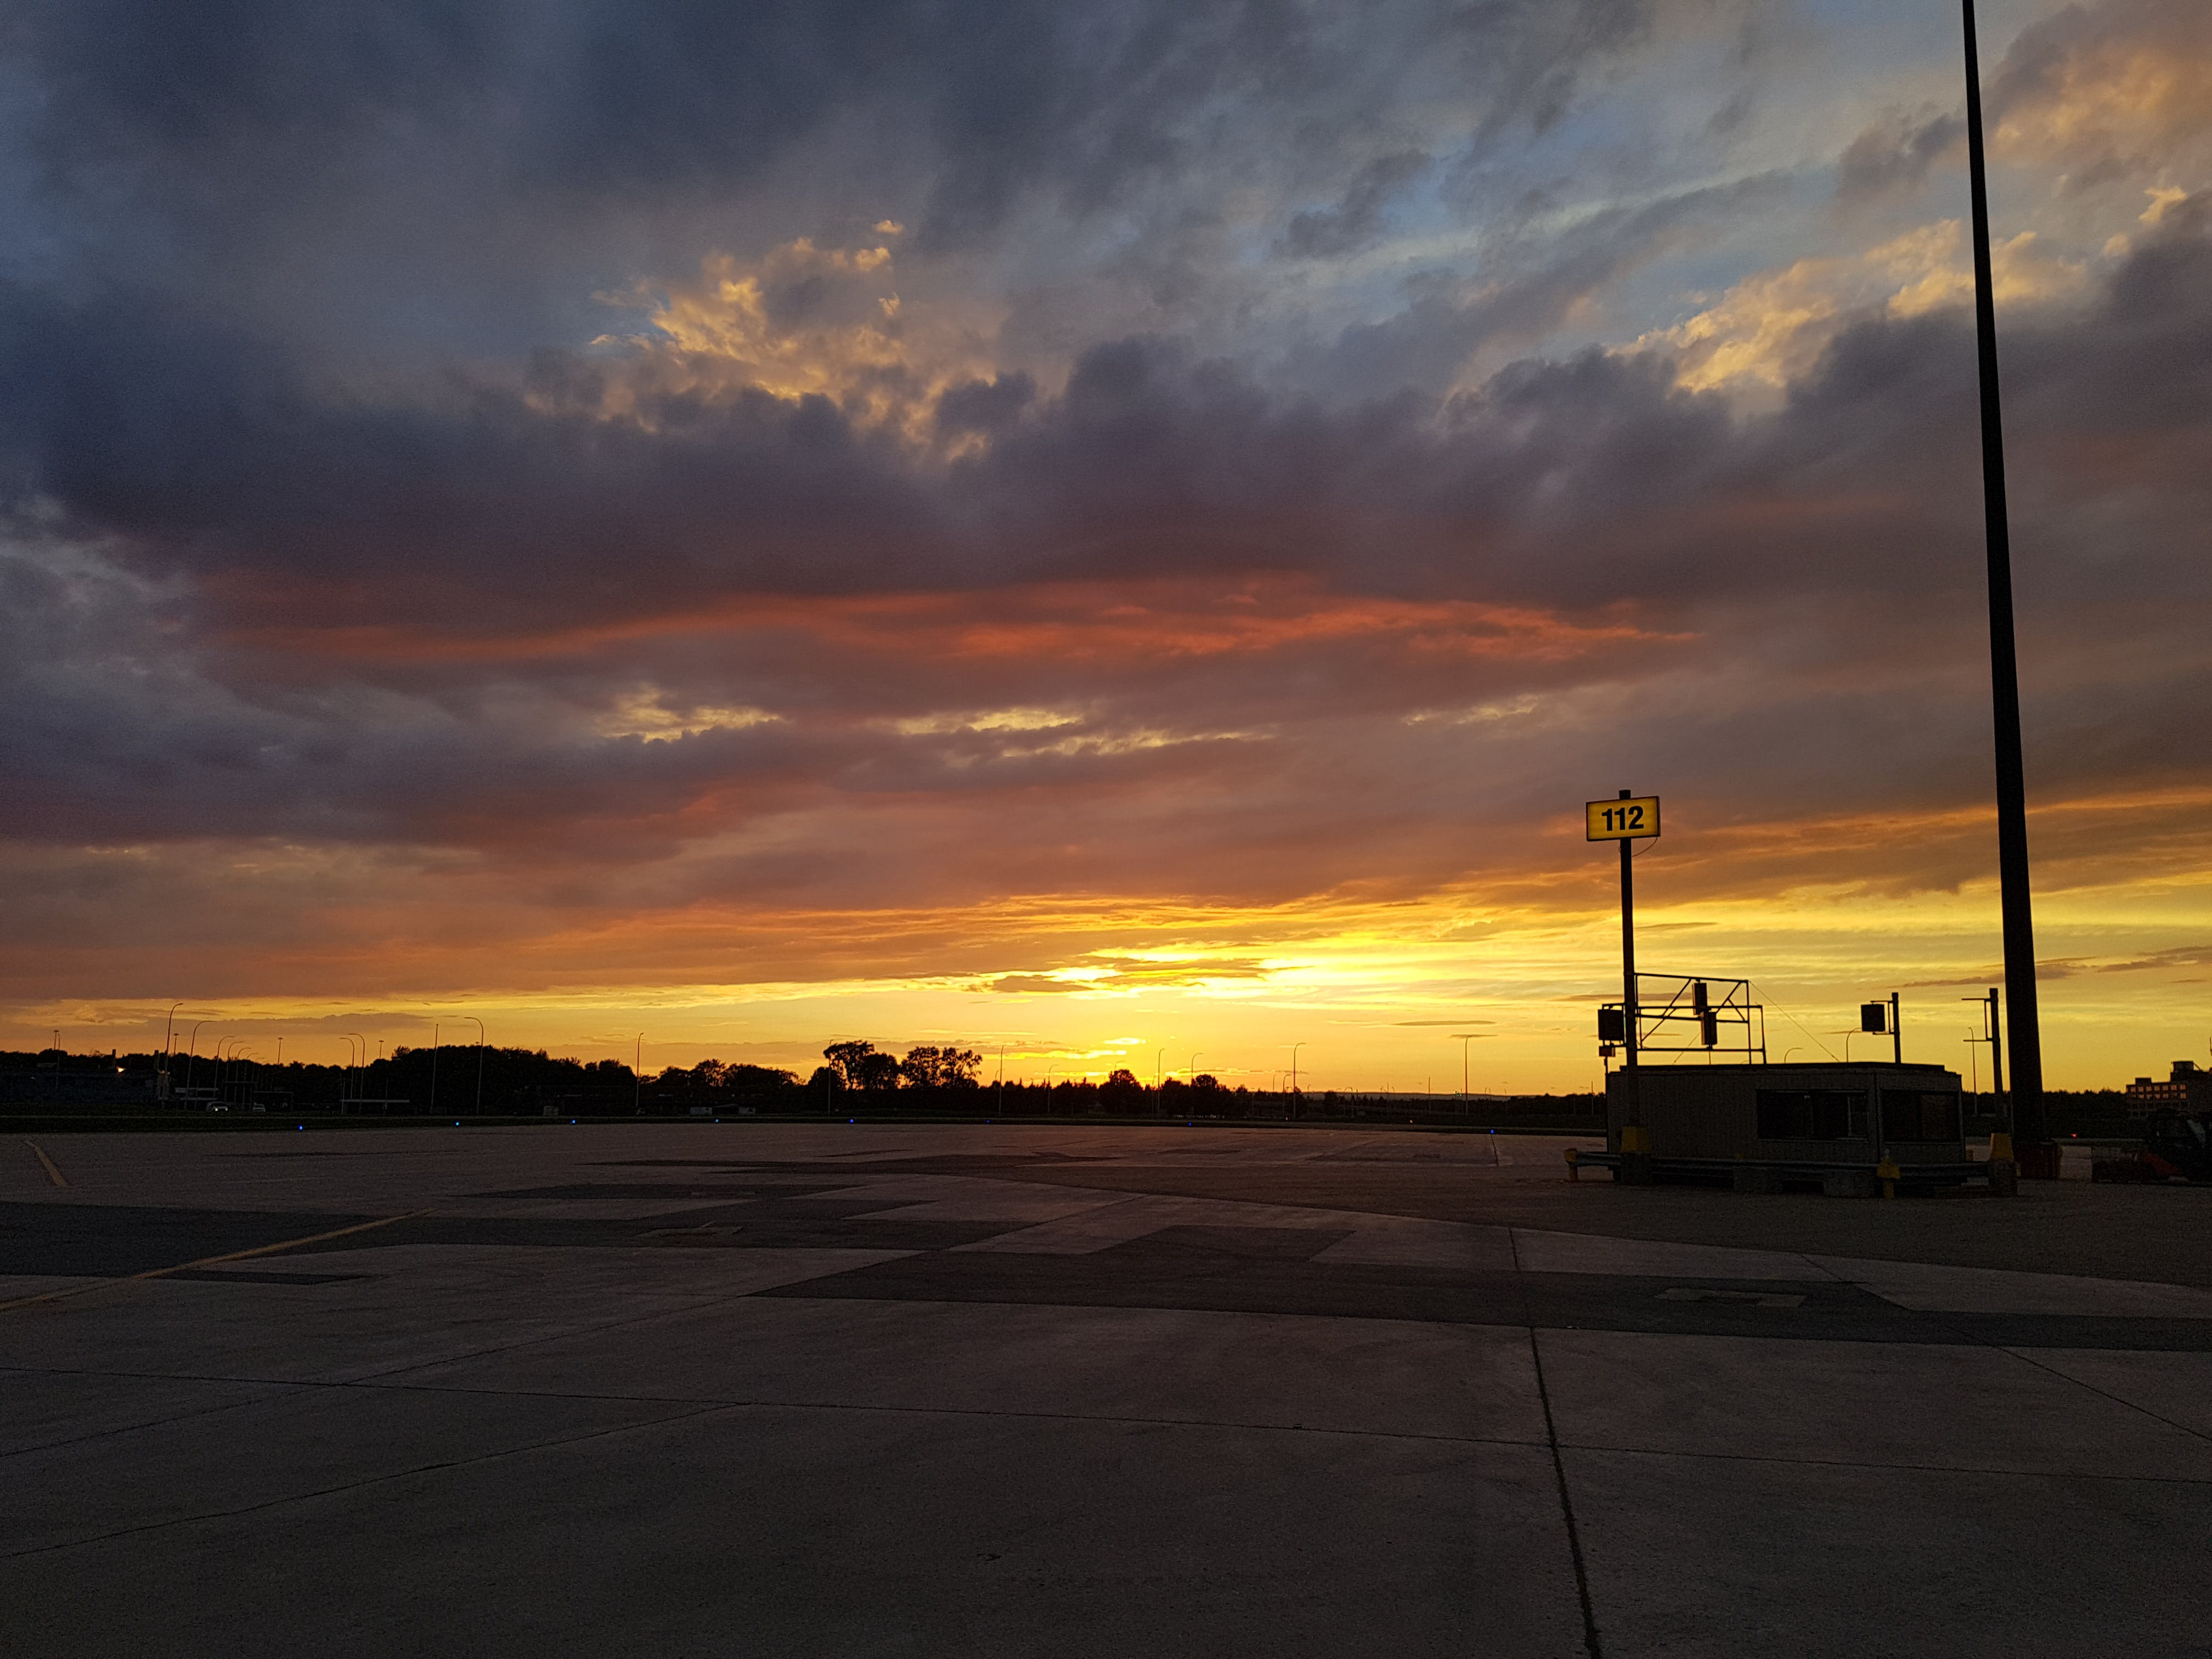 Photos gratuites de aéroport, canada, ciel, ciel du soir